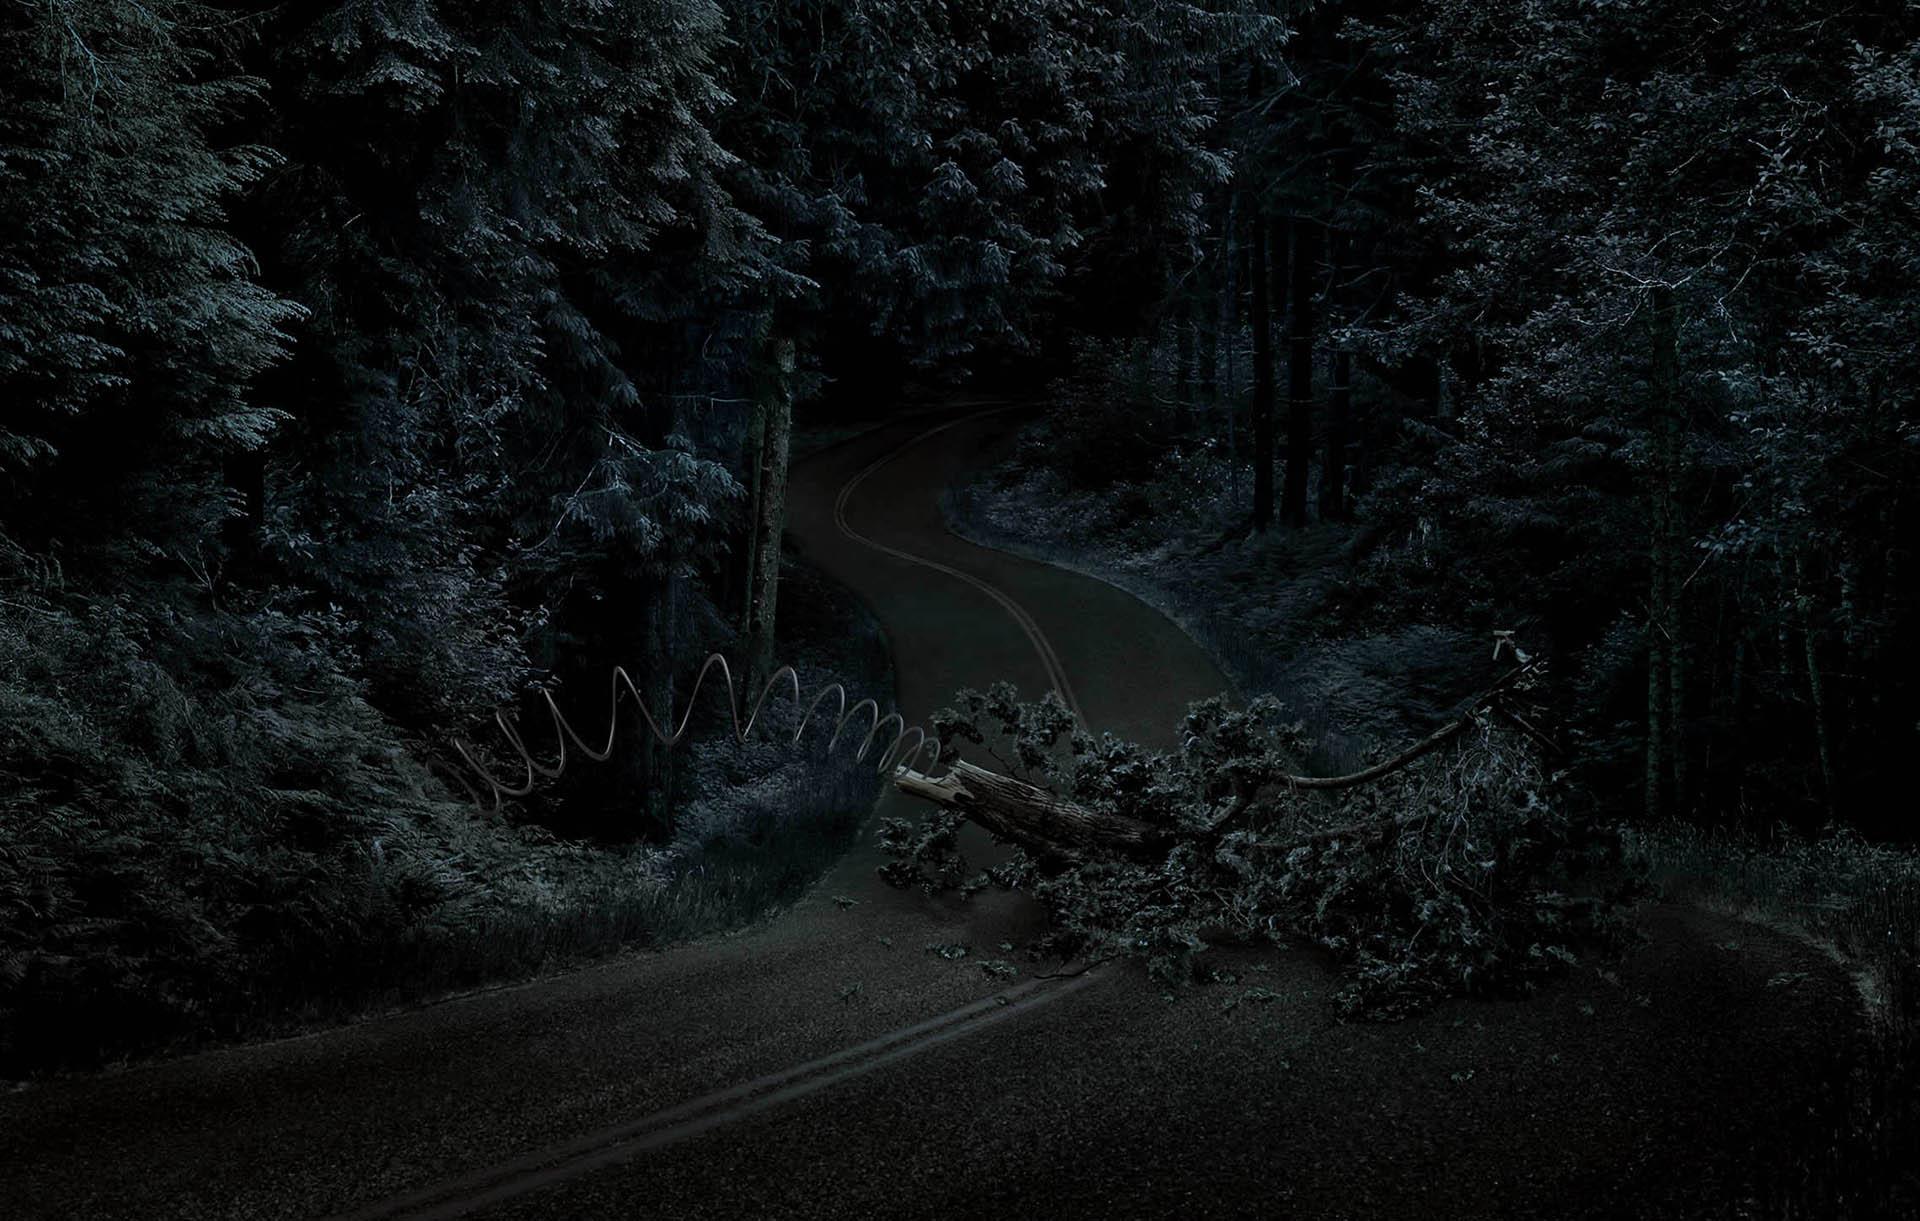 034 Mercedes-tree